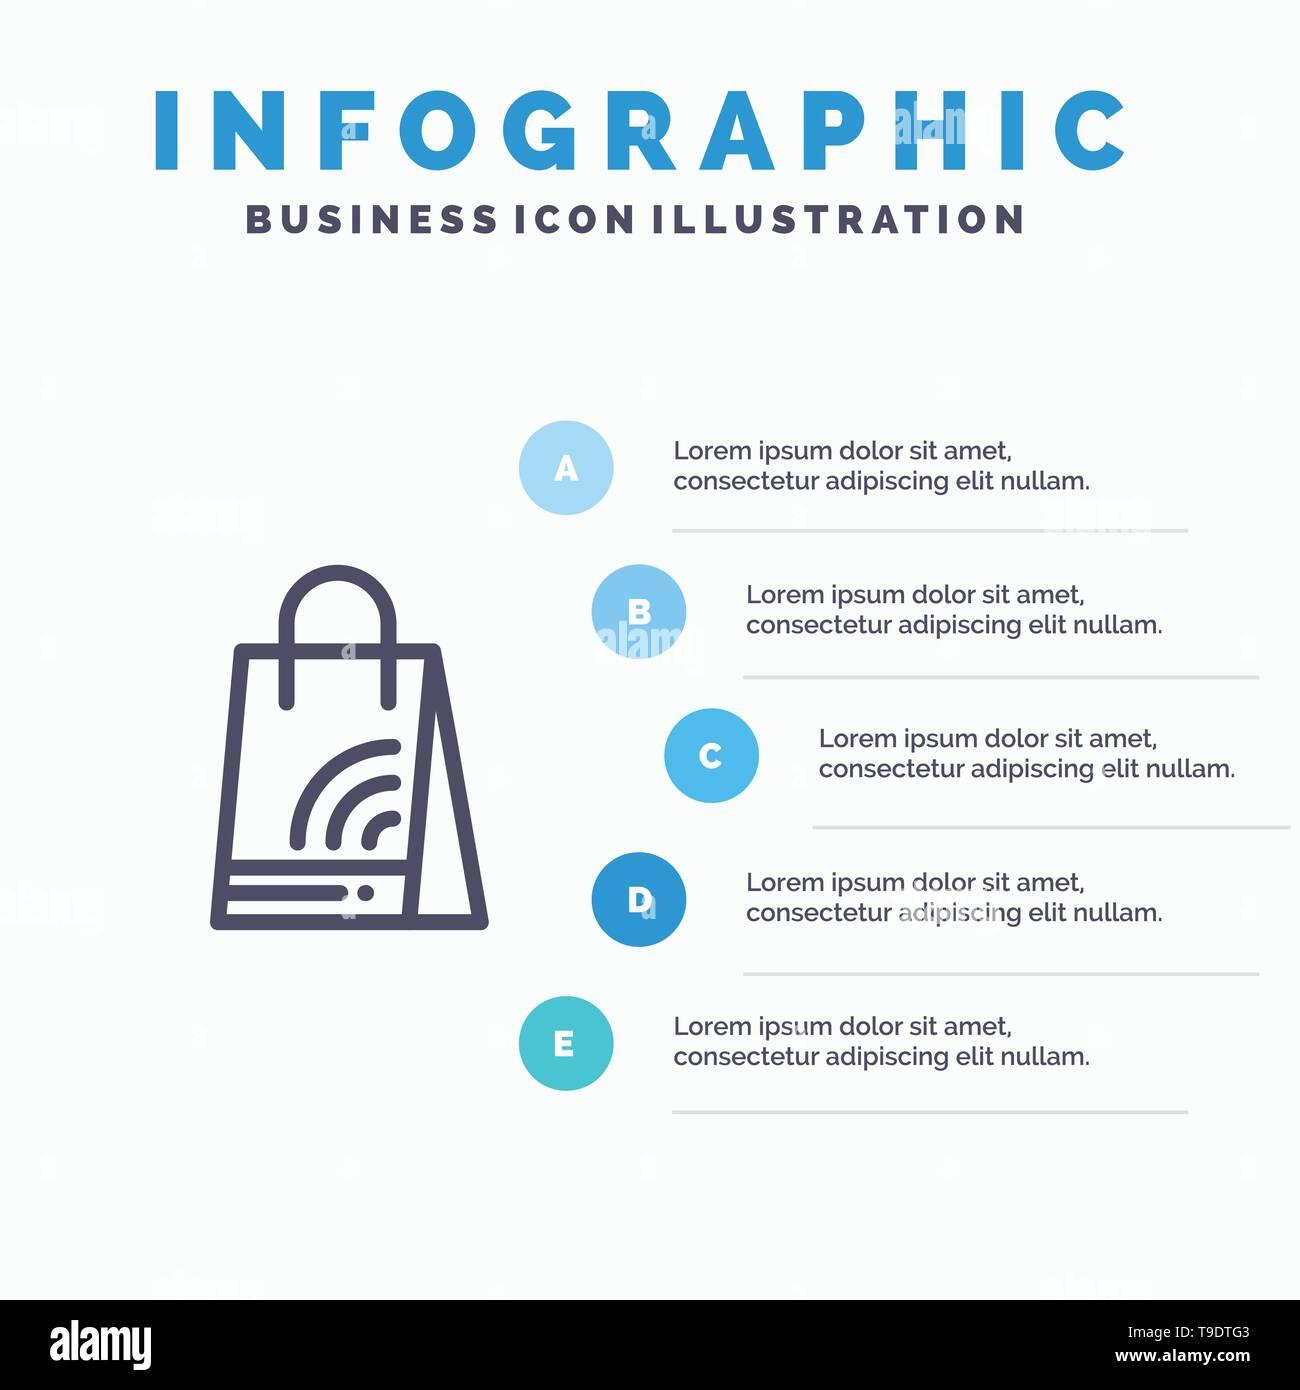 Bag, Handbag, Wifi, Shopping Line icon with 5 steps presentation infographics Background - Stock Image